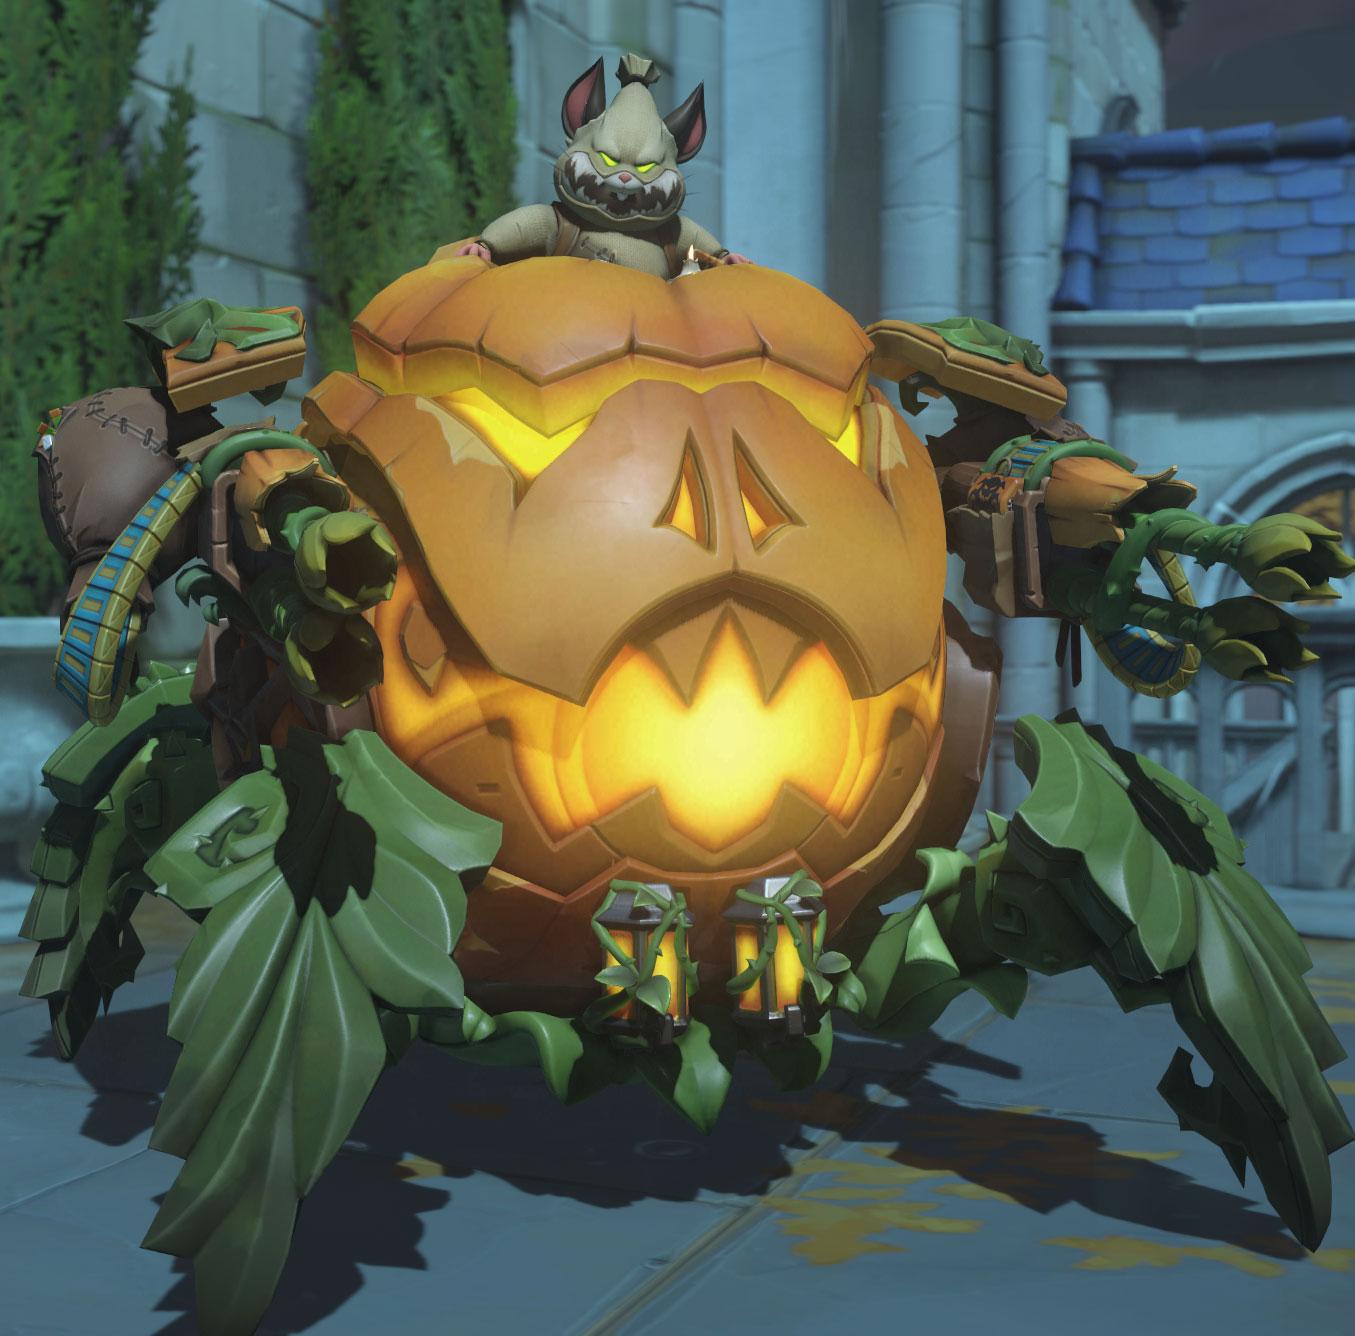 Overwatch Halloween Skins 2018 List Swamp Monster Banshee Jack O Lantern And More Pro